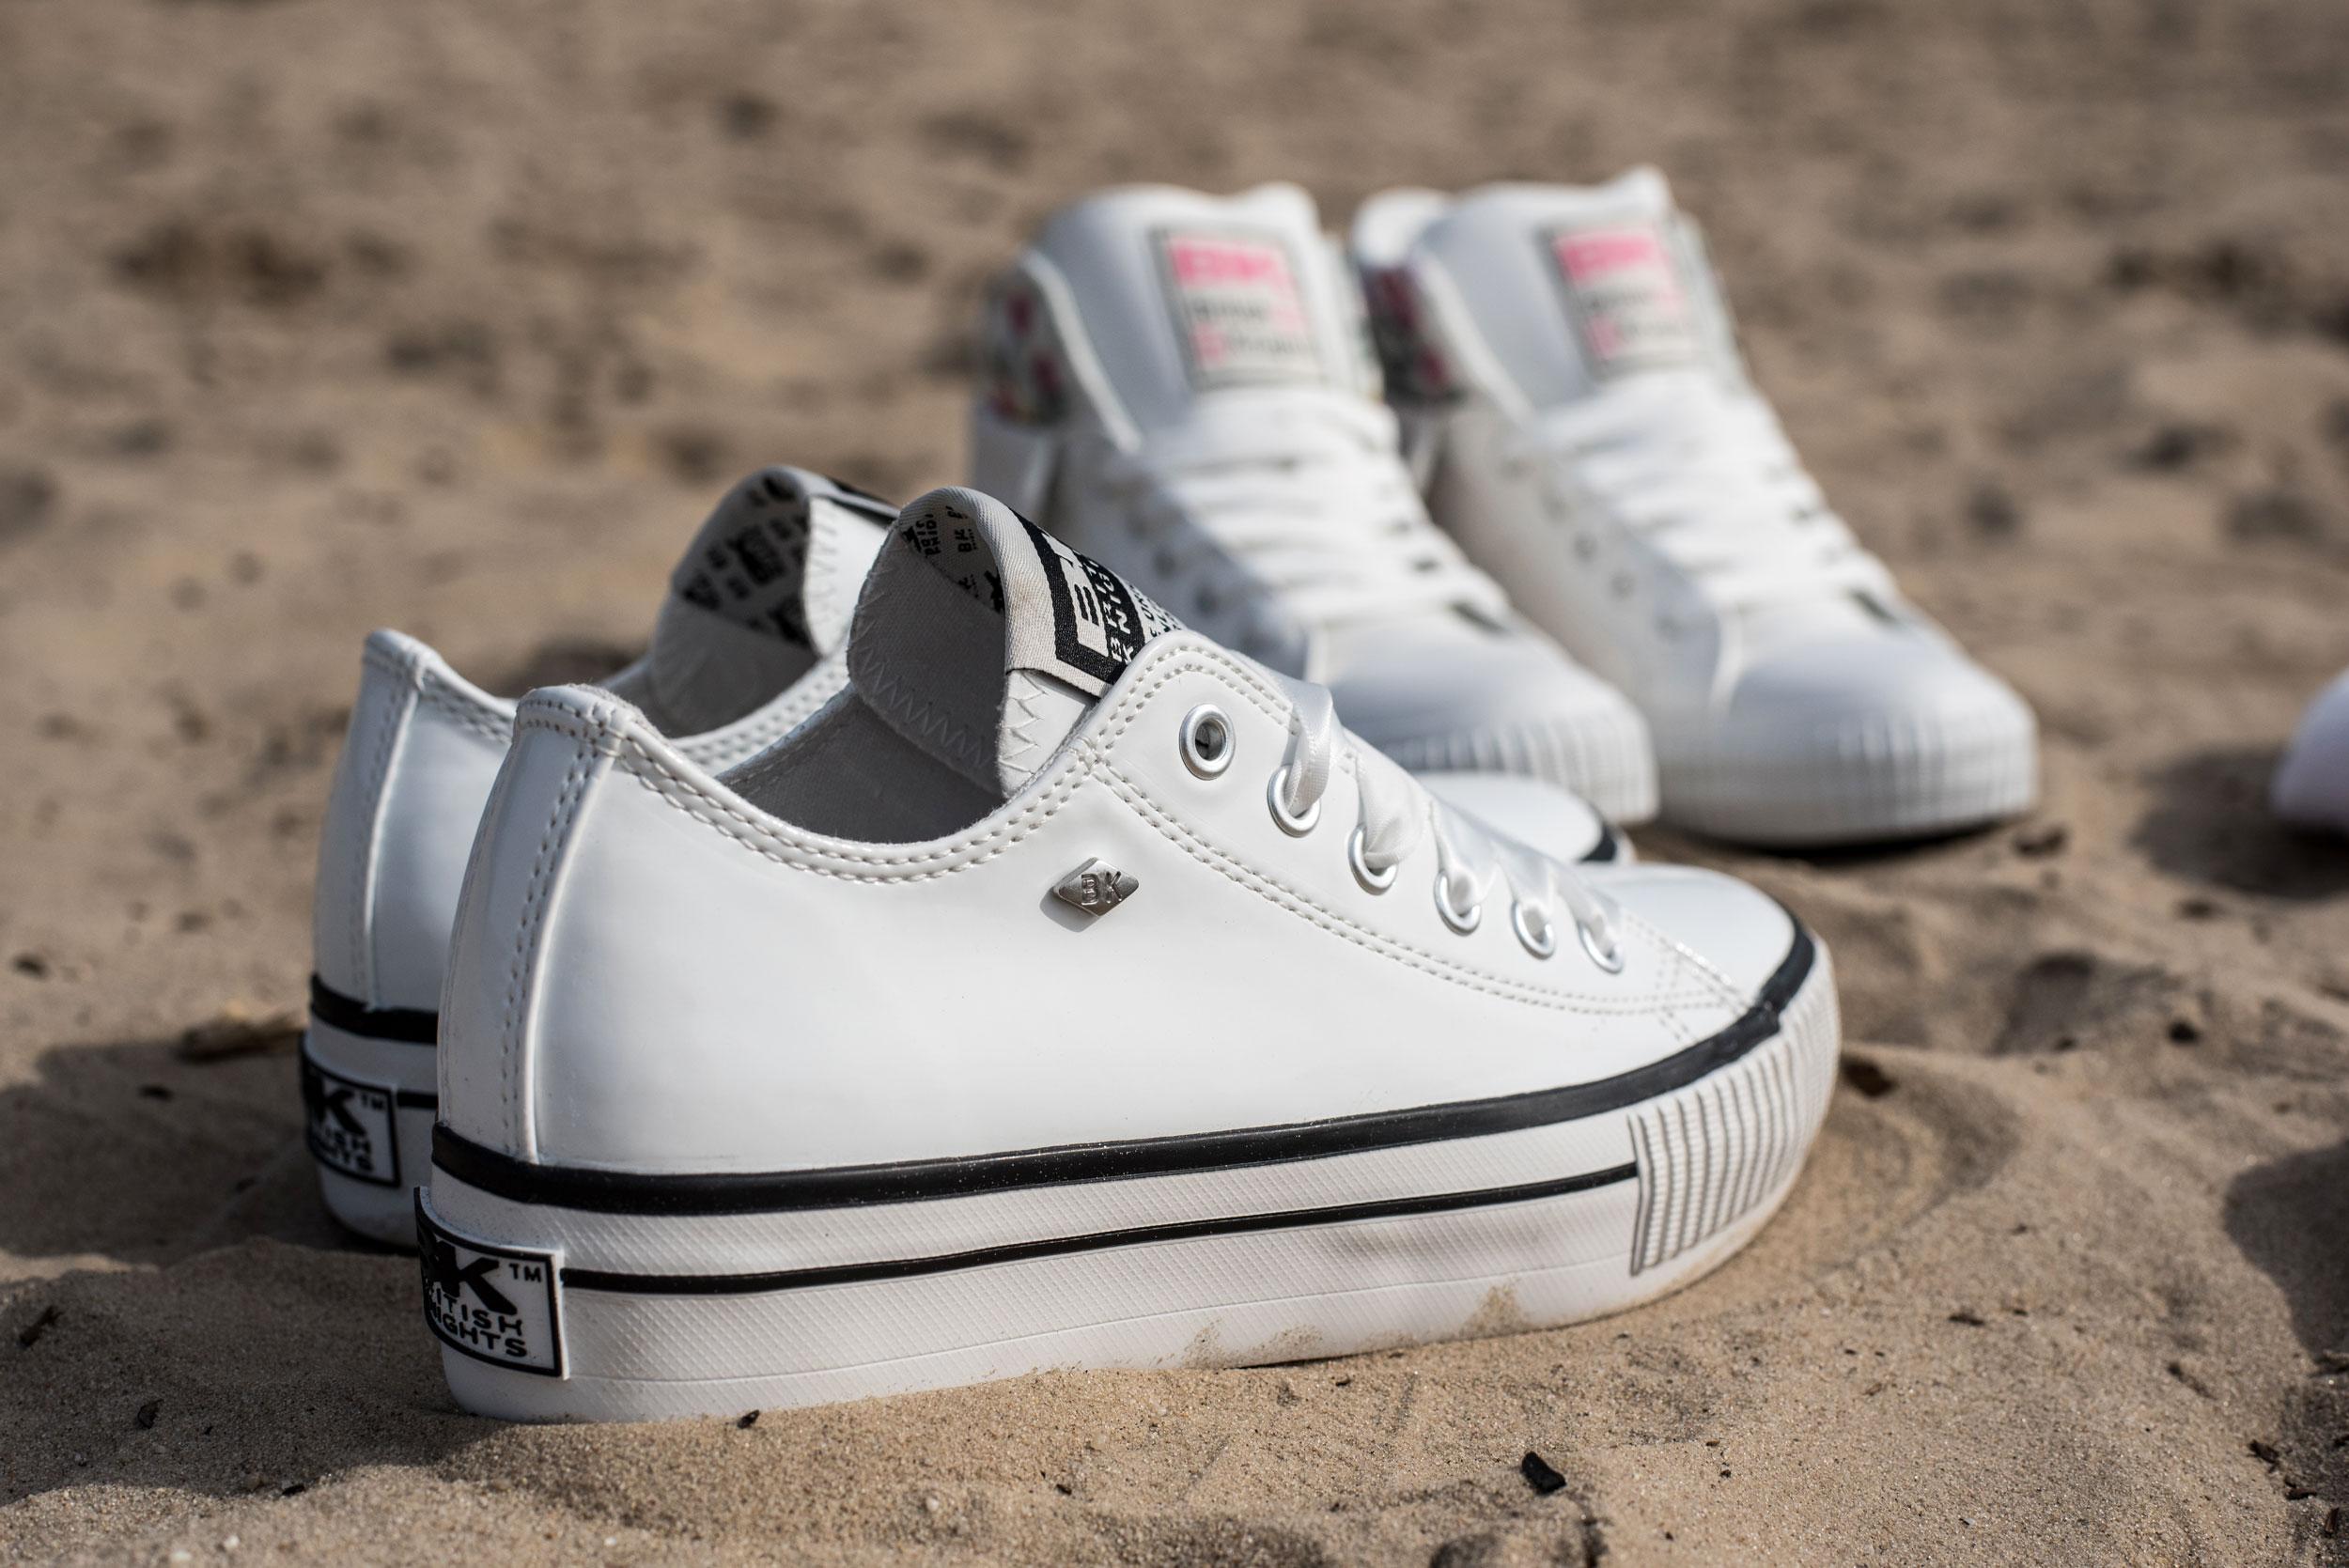 White shoes - British Knights MASTER PLATFORM